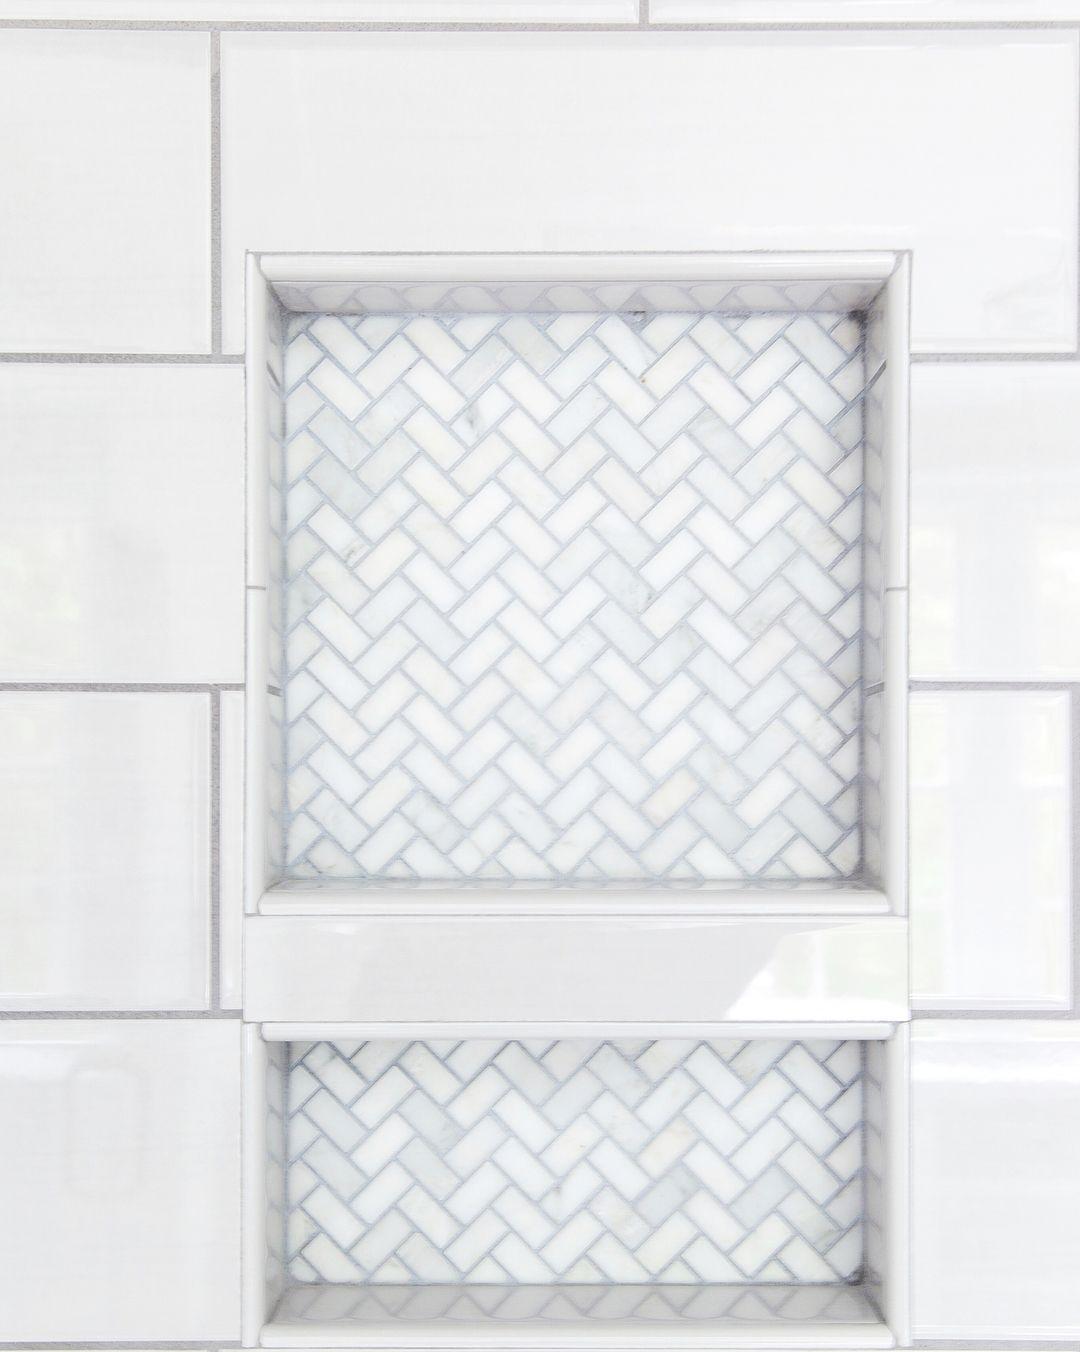 Kate H Design Marble Chevron Tile Detail In Shower Niche